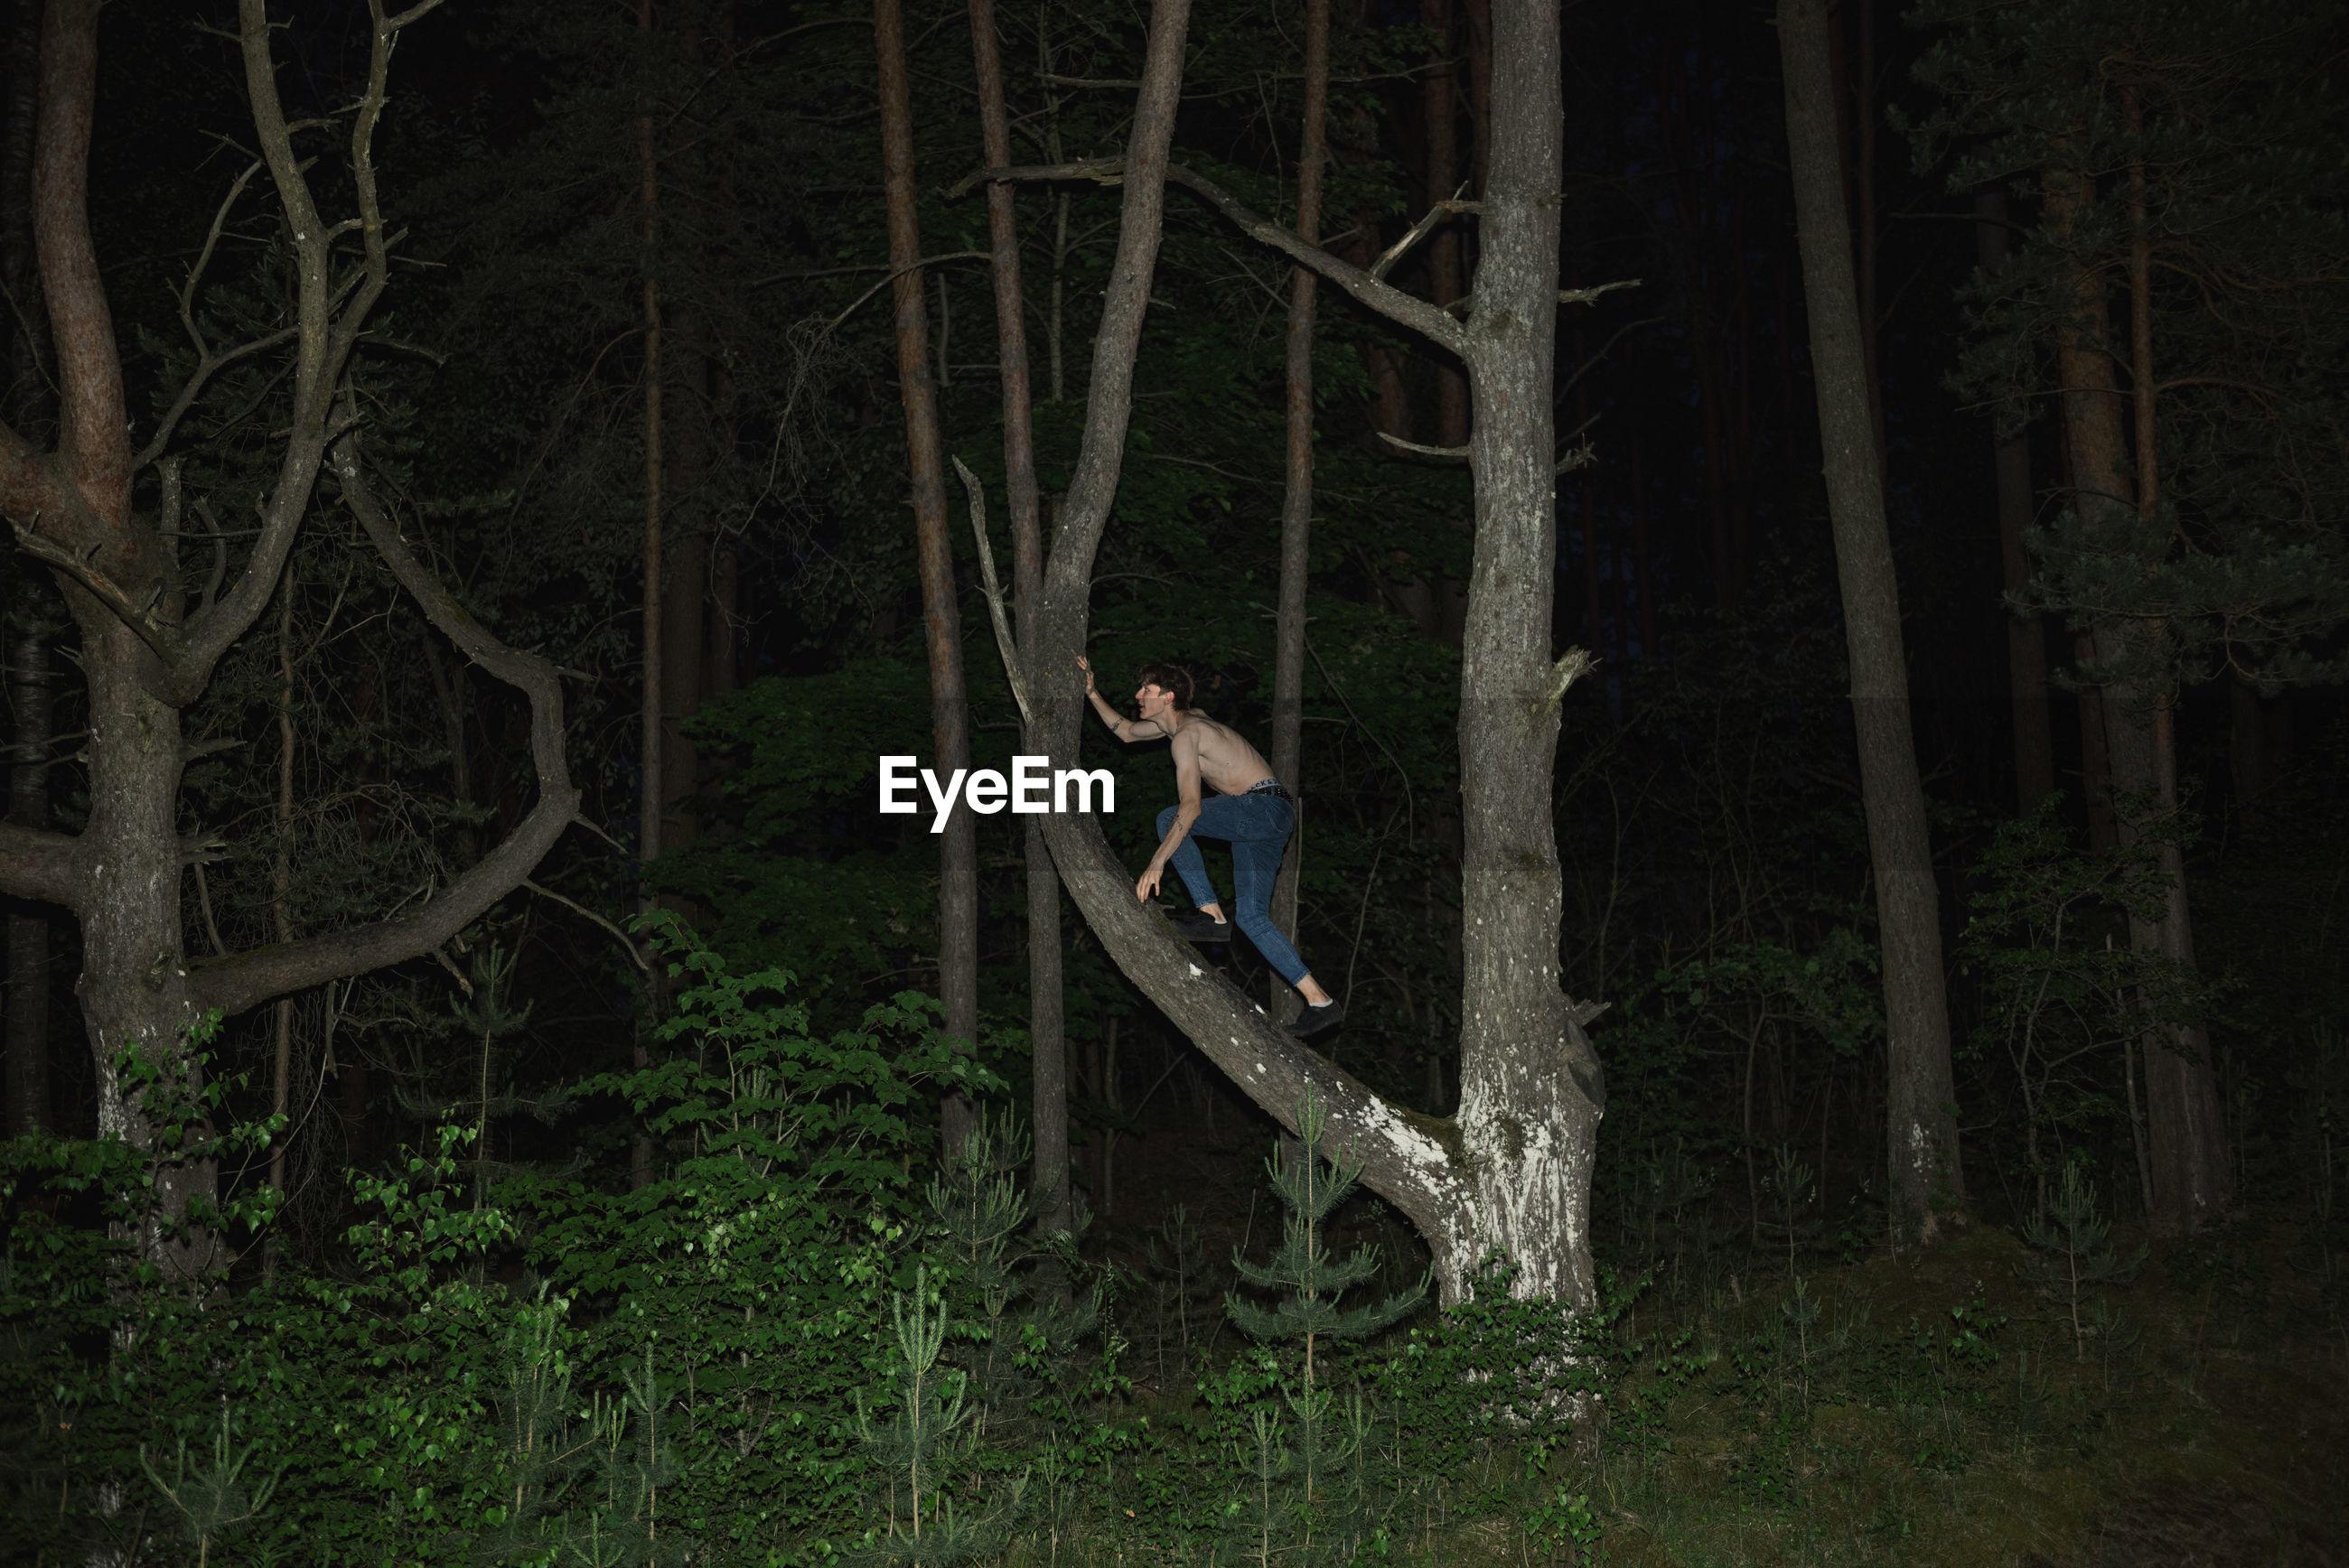 Shirtless young man climbing on tree during night